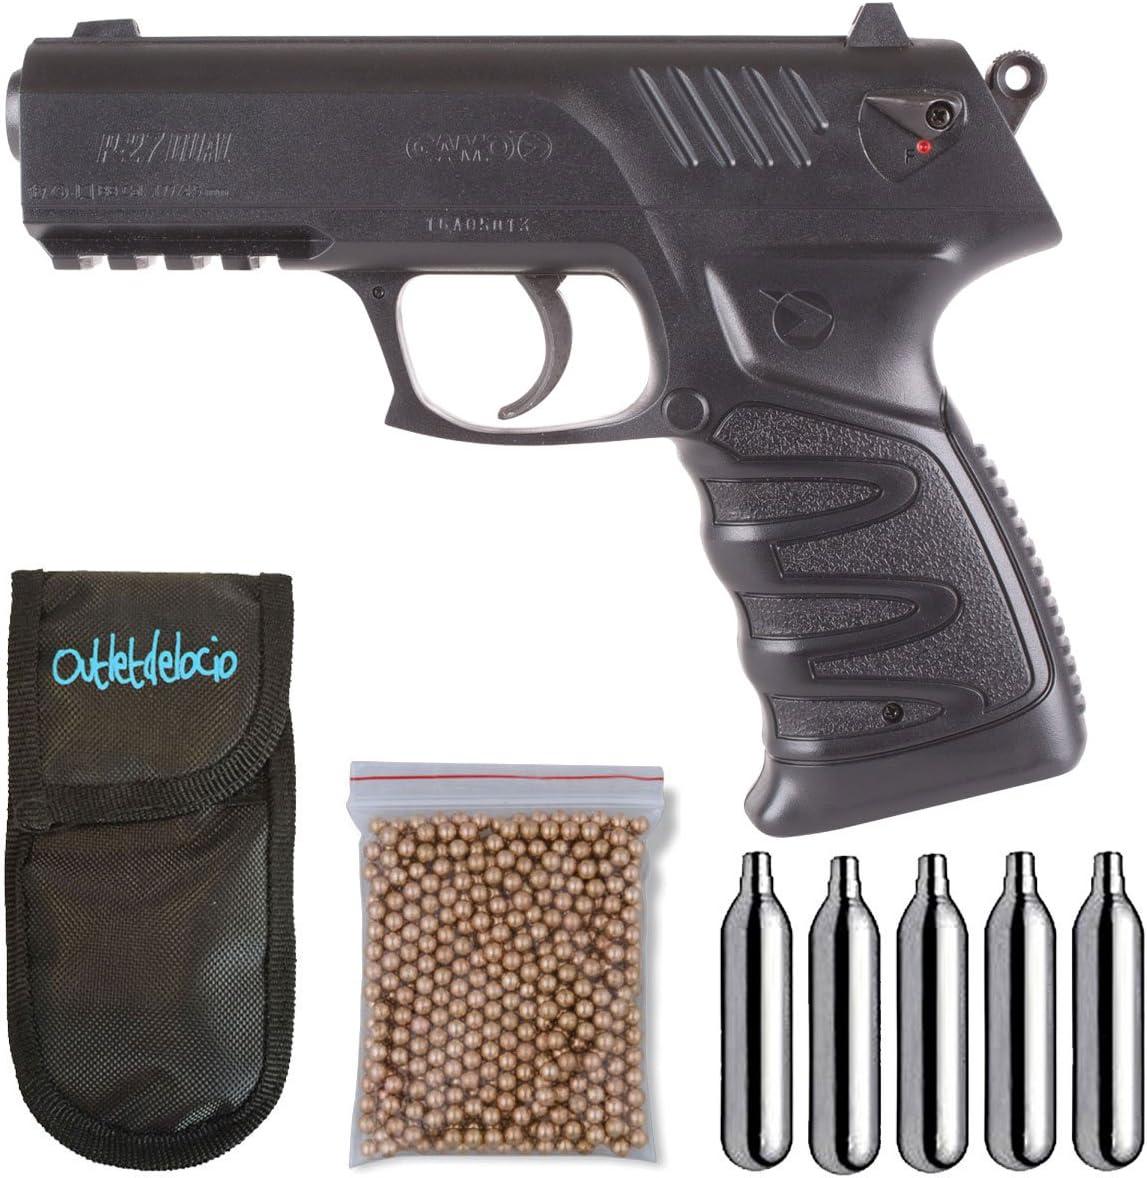 Outletdelocio. Pack Pistola Perdigón Gamo P-27 Dual. Calibre 4,5mm. Funda Portabombonas, Balines y Bombonas co2, 23054/29318/38123